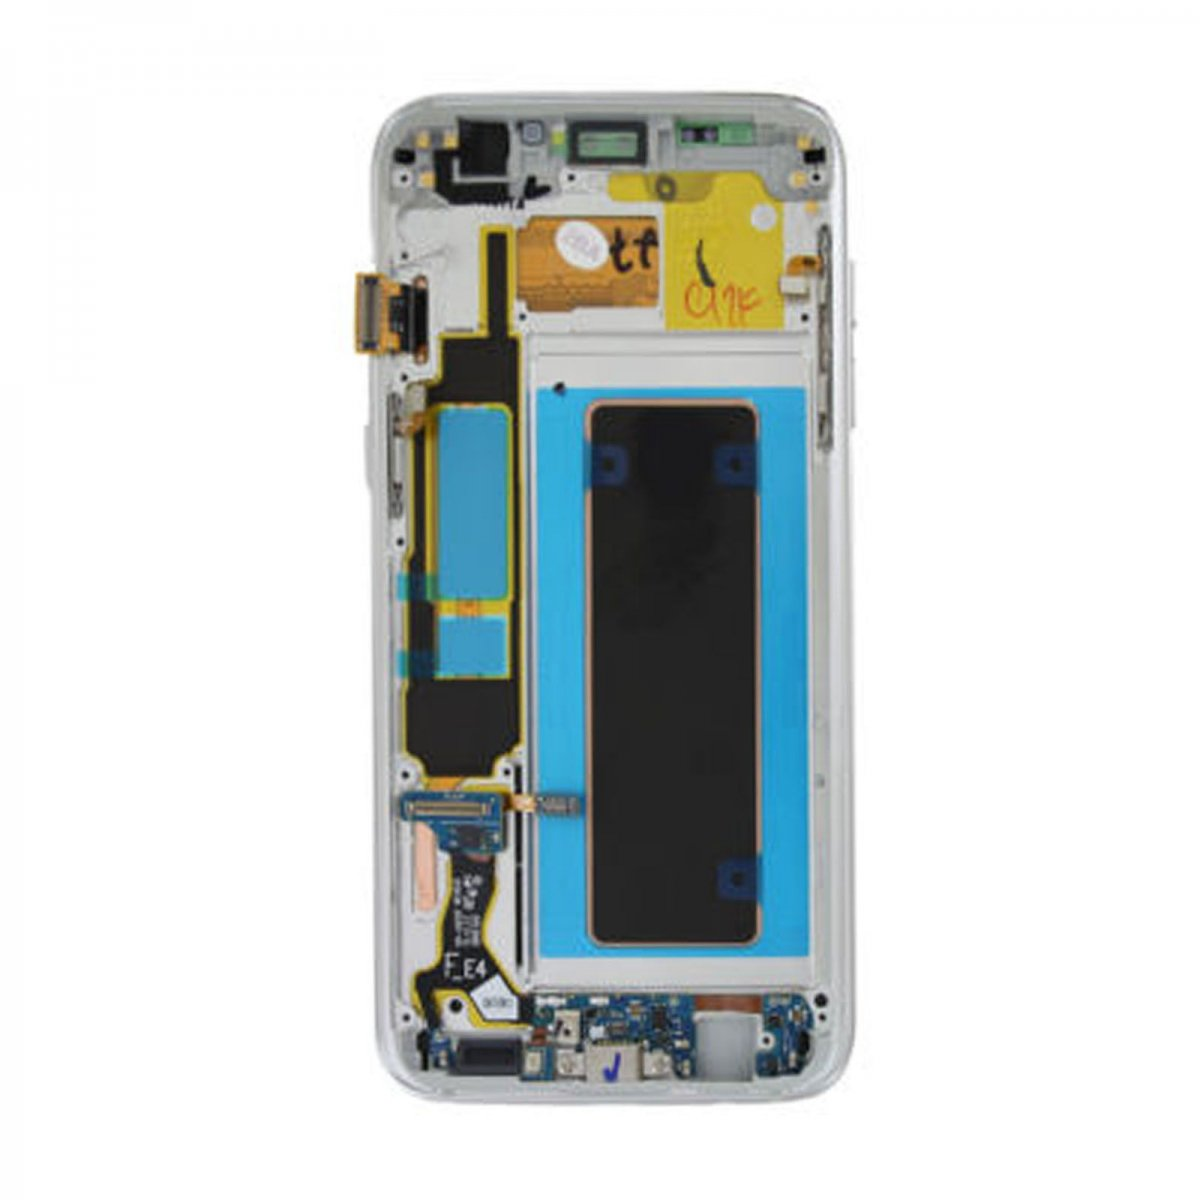 Original Samsung Galaxy S8 S8 Plus Notering 8 Snabb Laddare